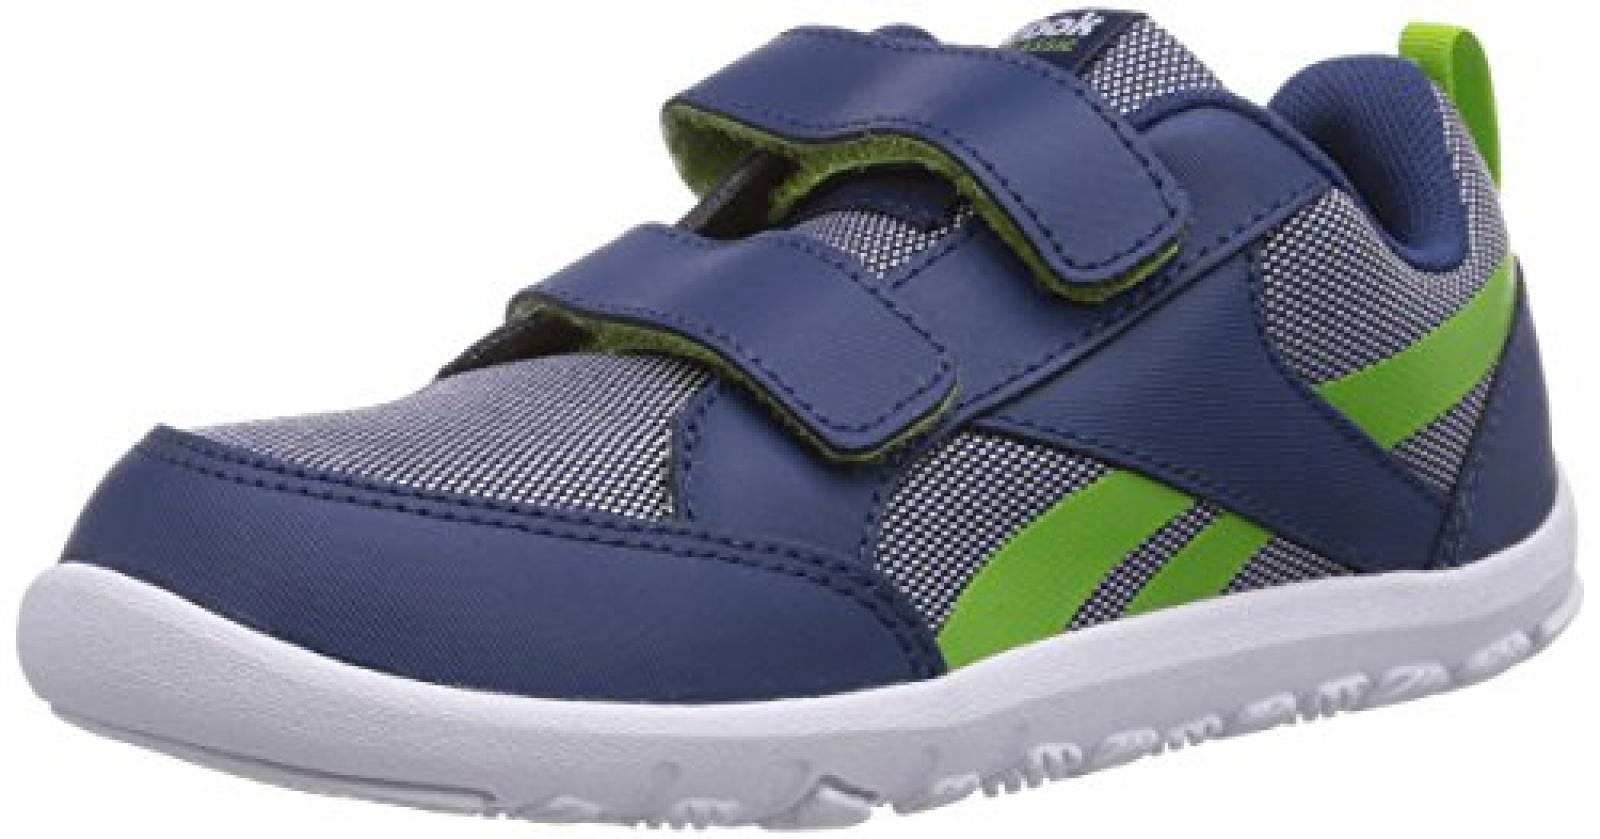 Reebok Ventureflex Chase Jungen Sneakers